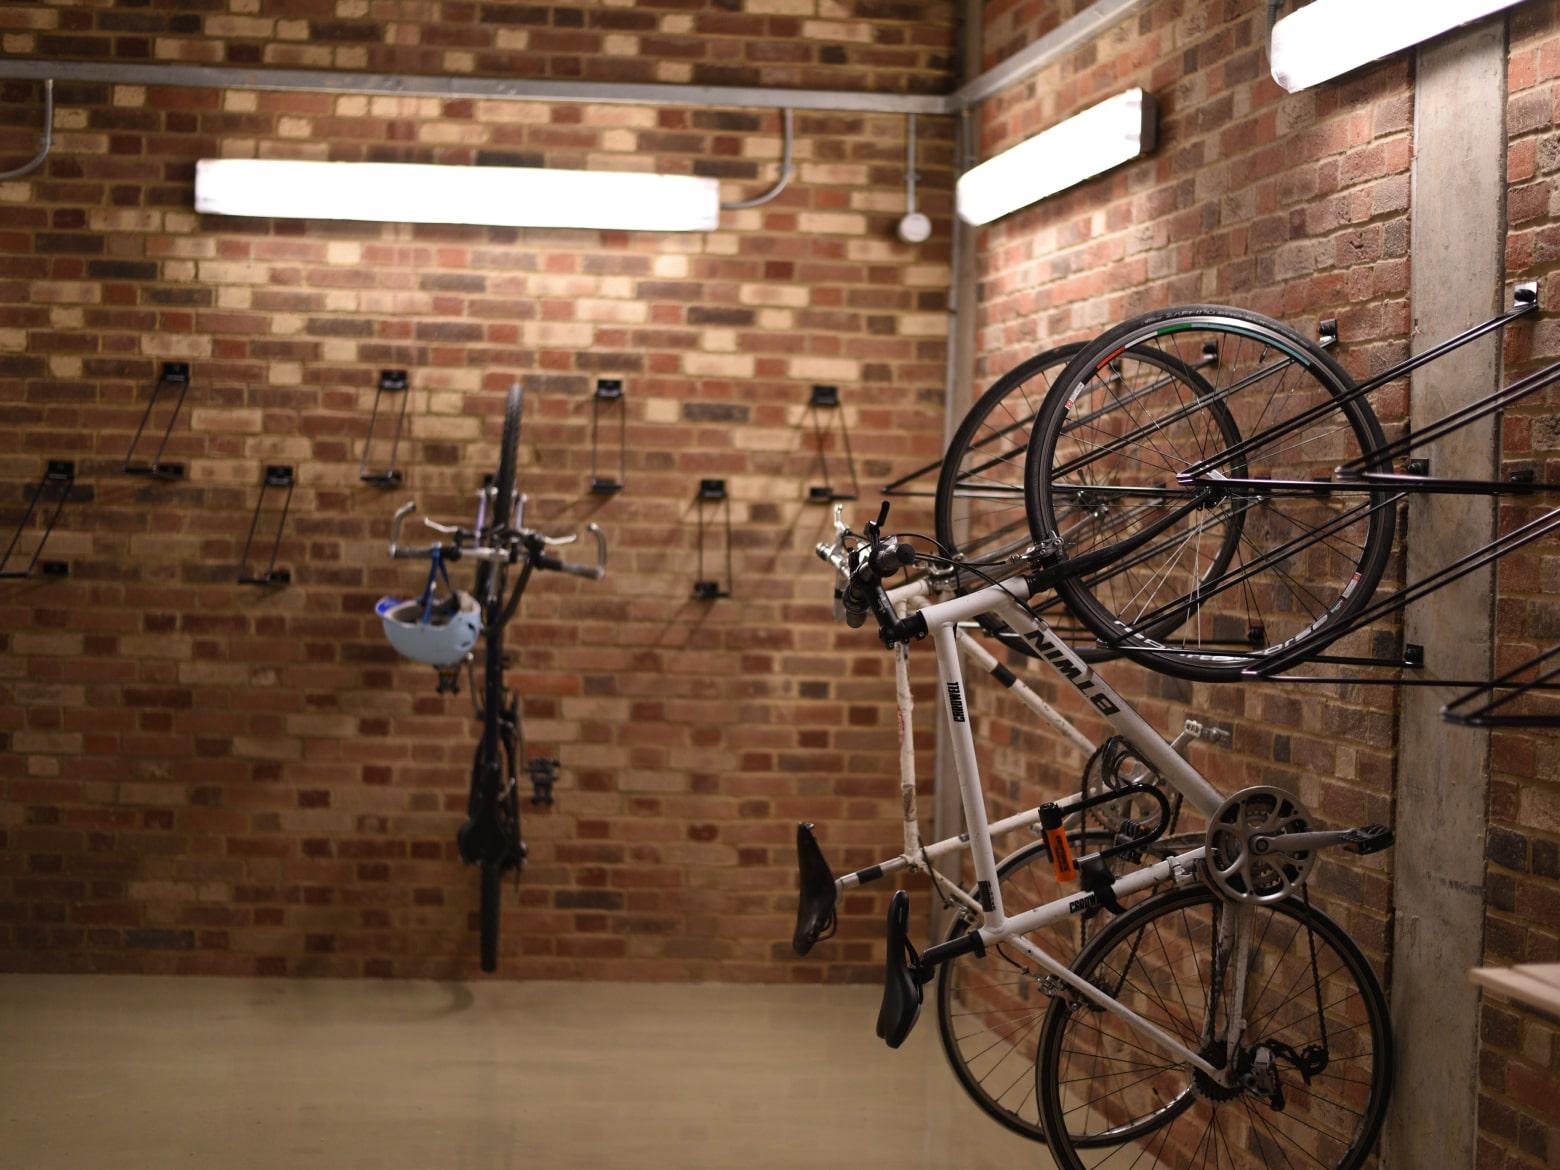 Basement bike store and racks